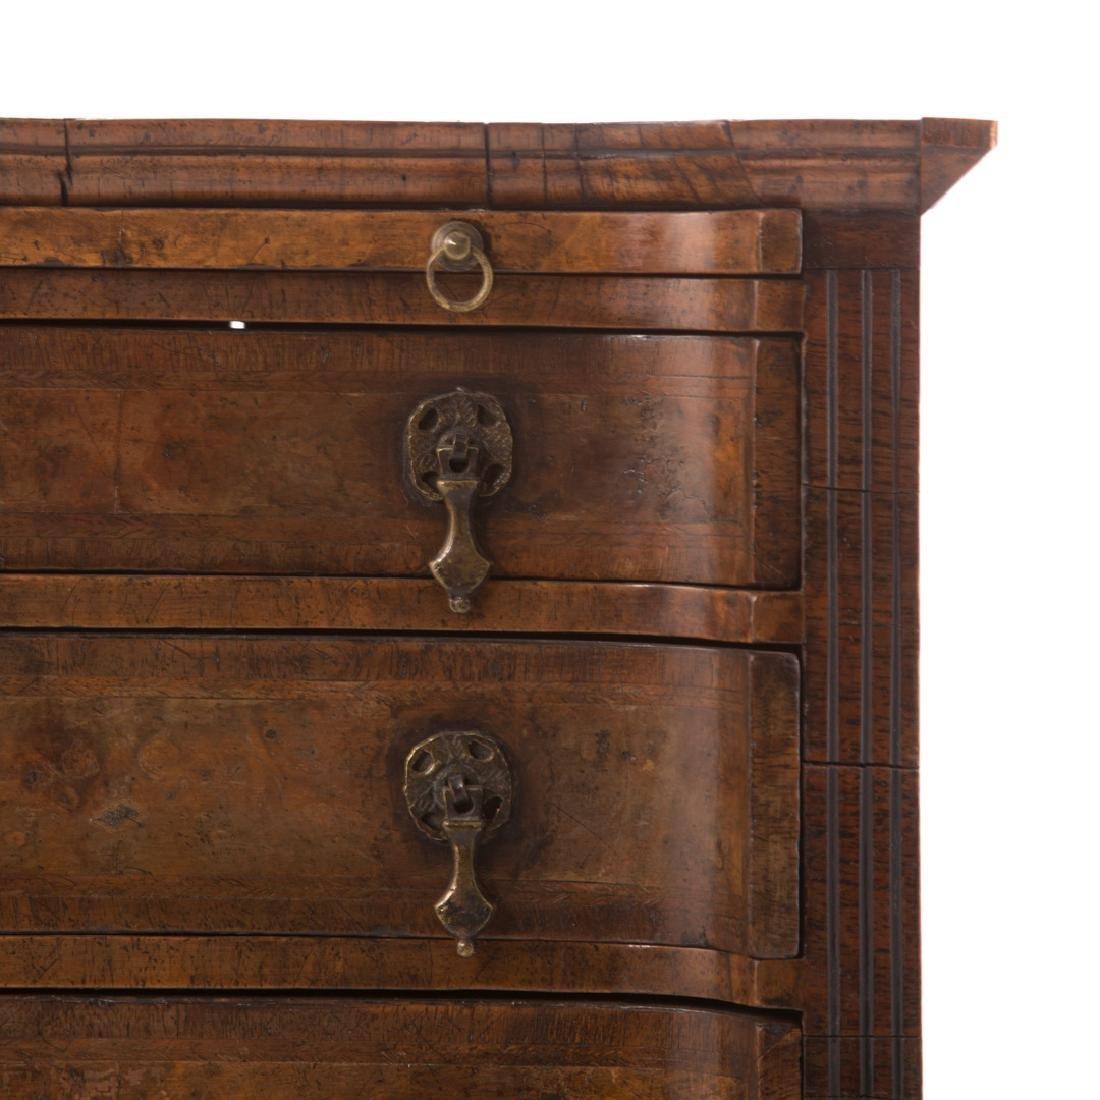 Rare miniature William IV bachelor's chest - 2